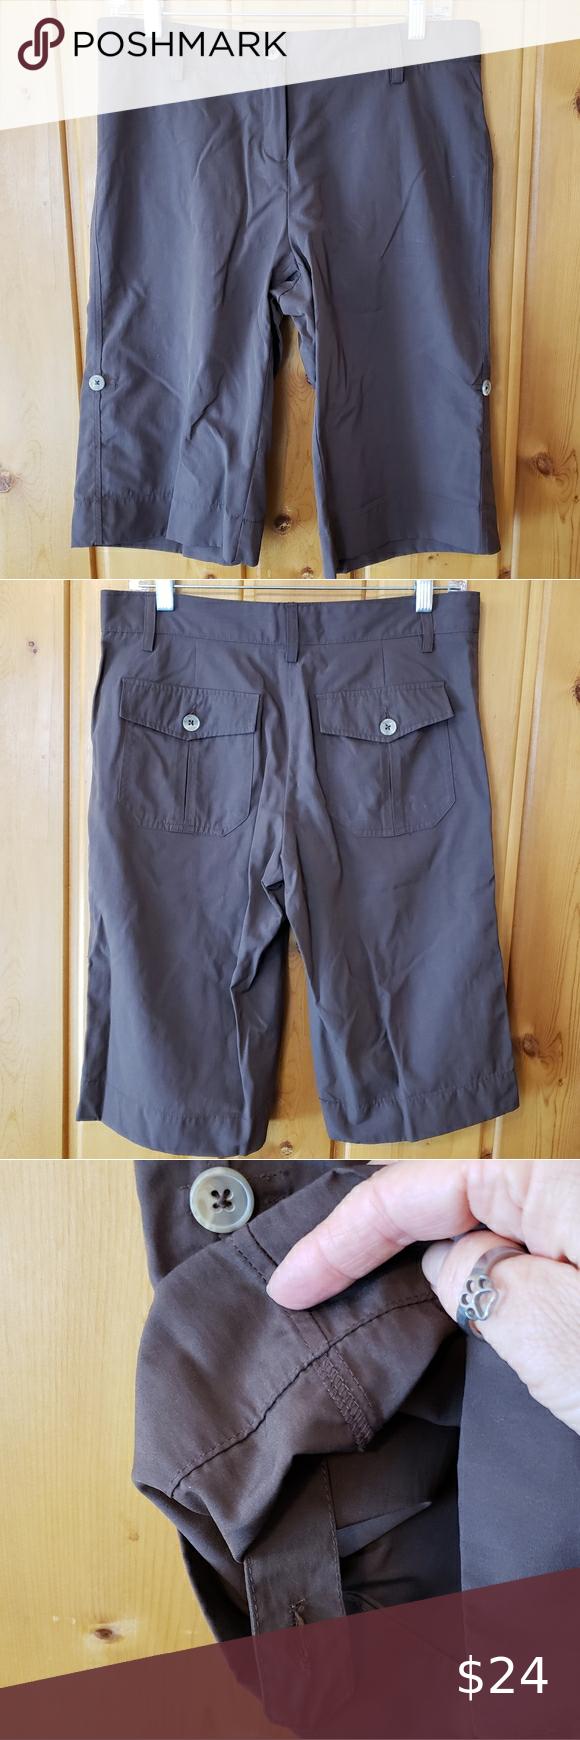 Weatherproof Shorts